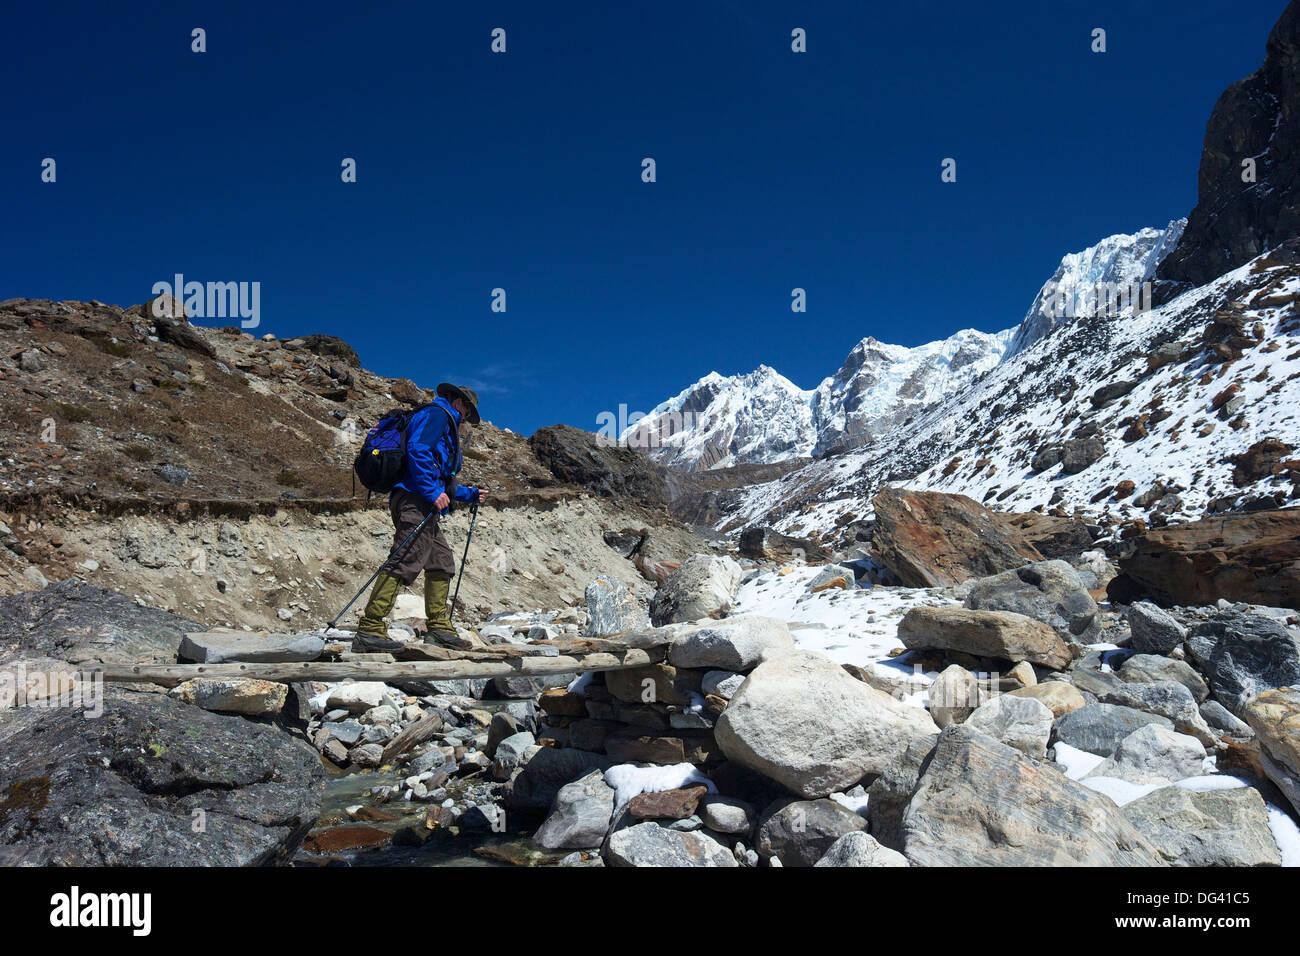 Trekker crossing the Chola Khola valley near Dzonglha, Sagarmatha National Park, UNESCO Site, Nepal, Himalayas - Stock Image